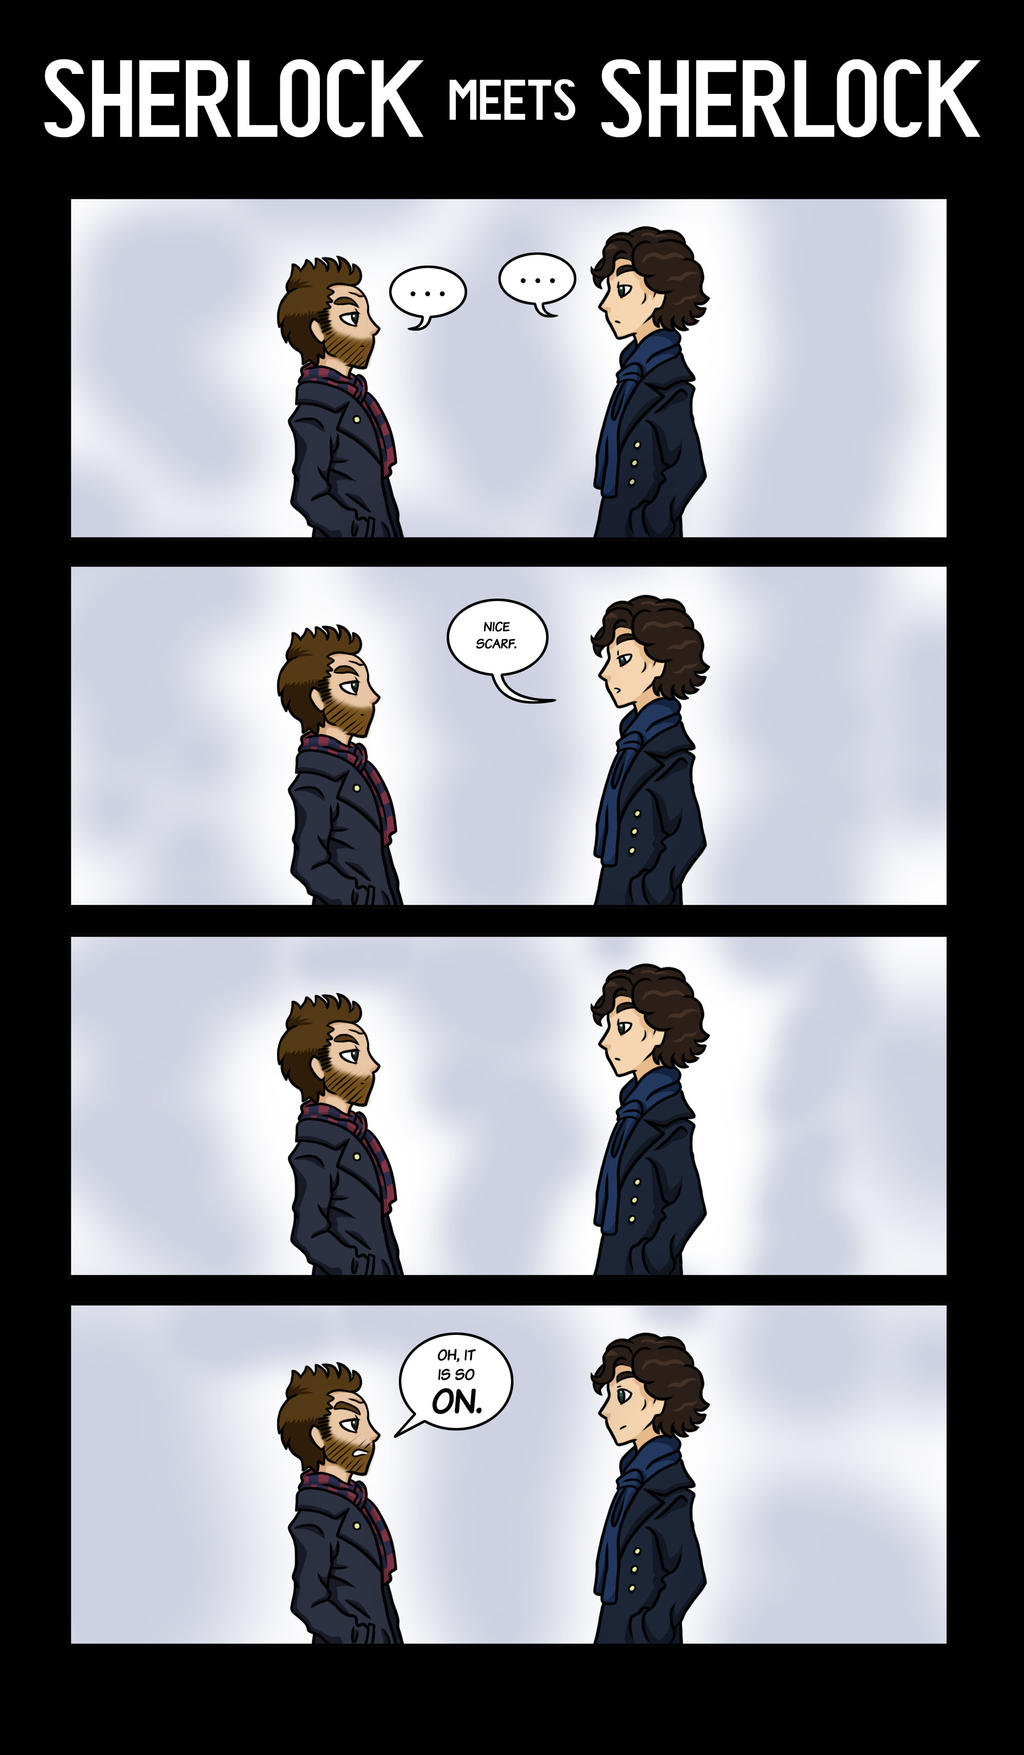 Sherlock meets Sherlock by maryfgr23